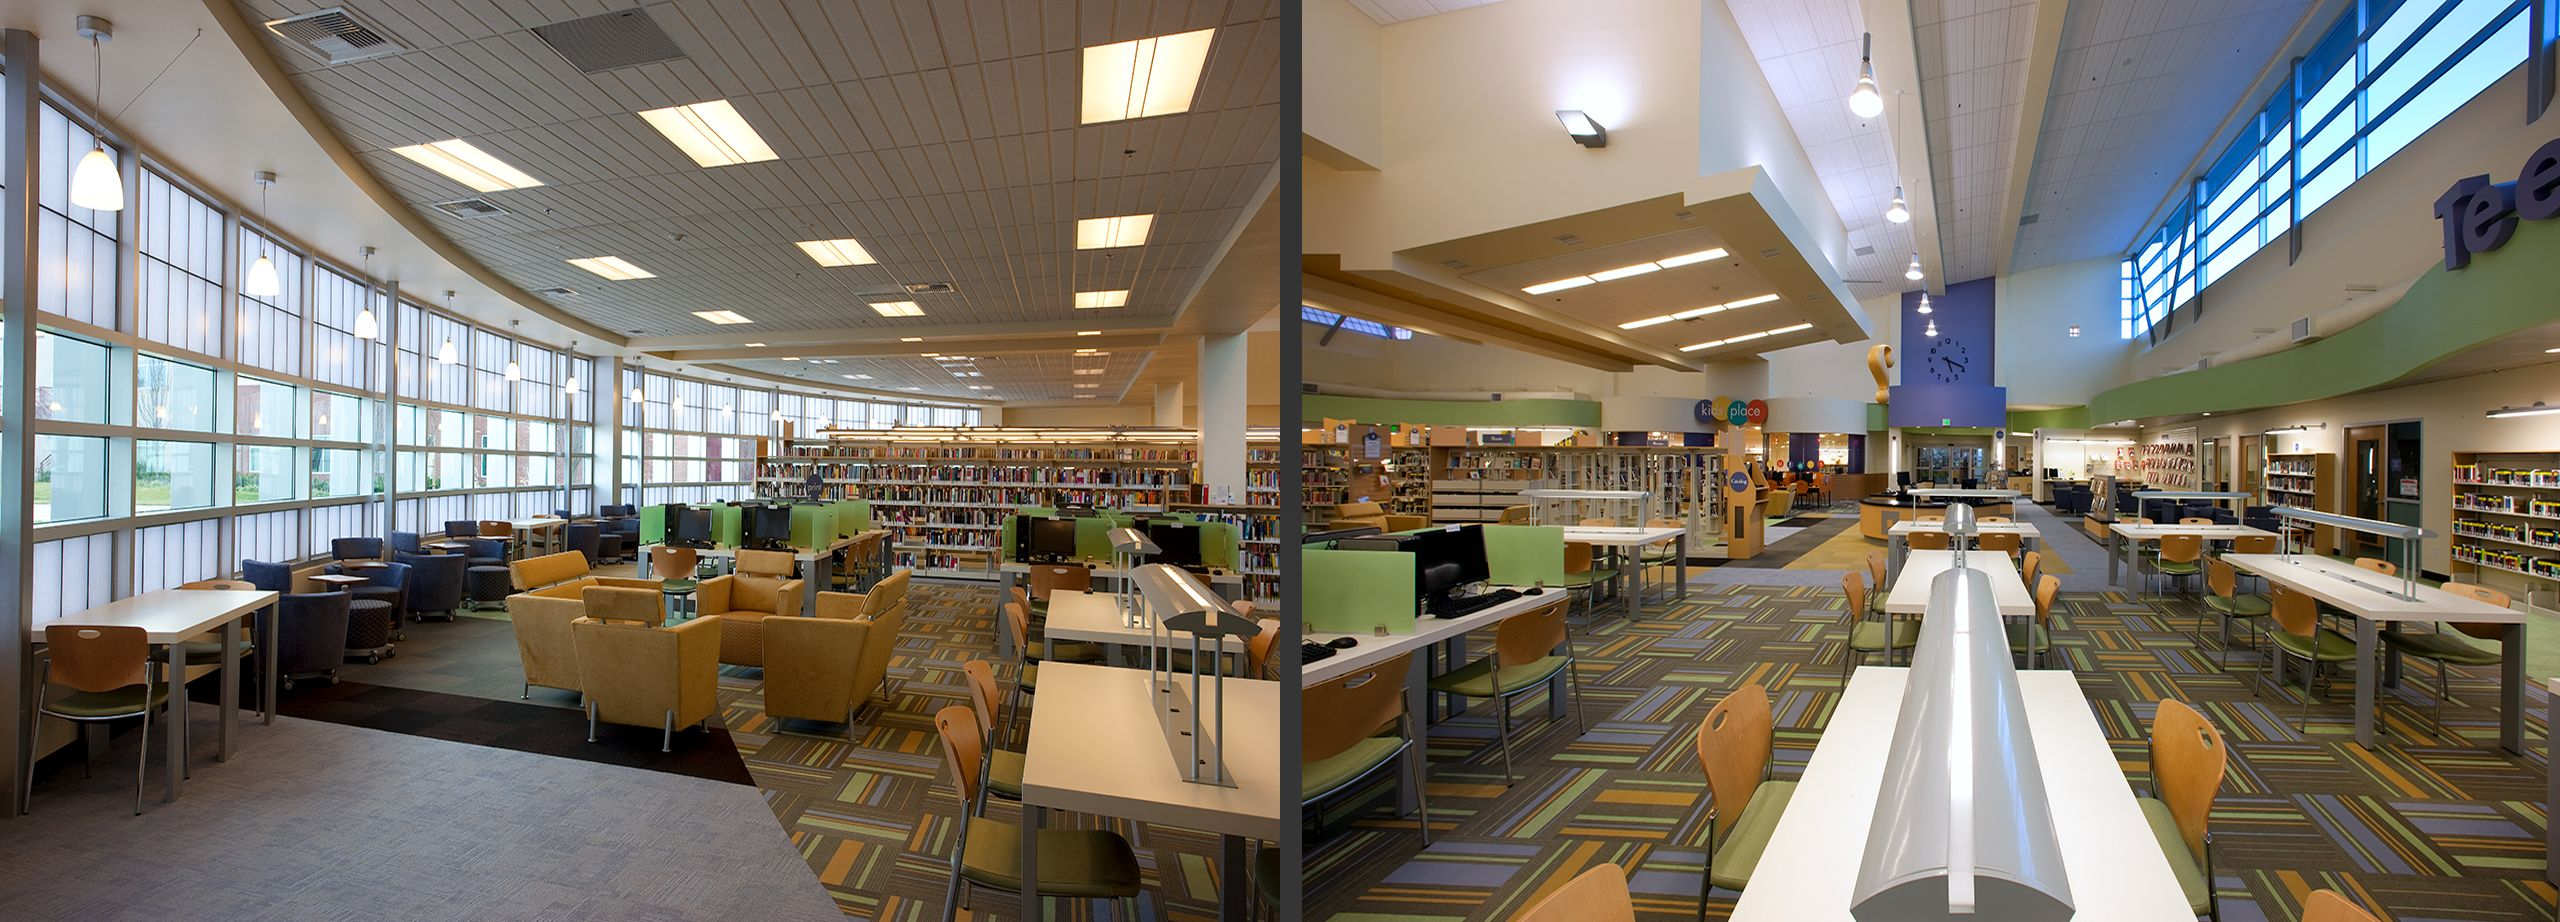 Library.5.jpg